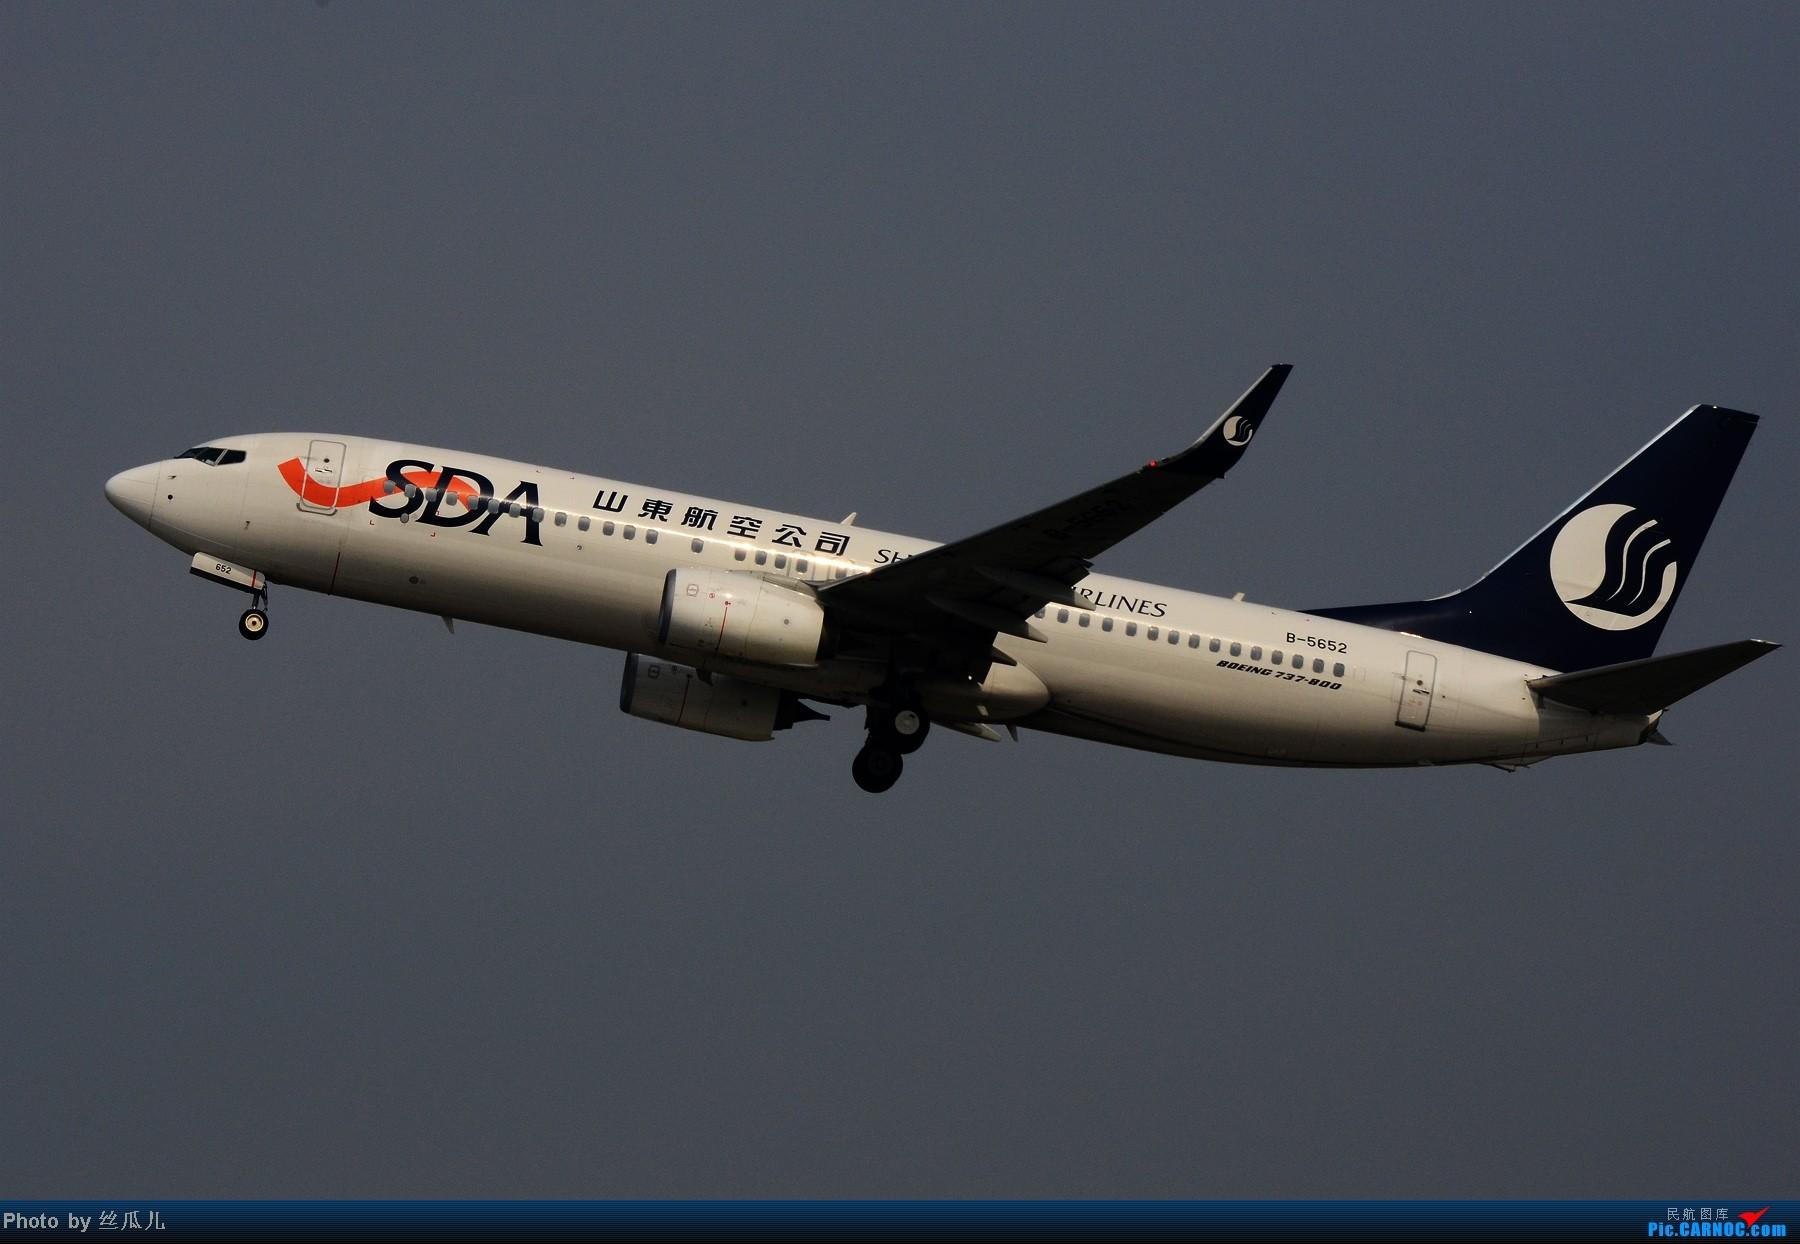 Re:[原创]2013年3月3日-萧山机场-晴 BOEING 737-800 B-5652 中国杭州萧山机场